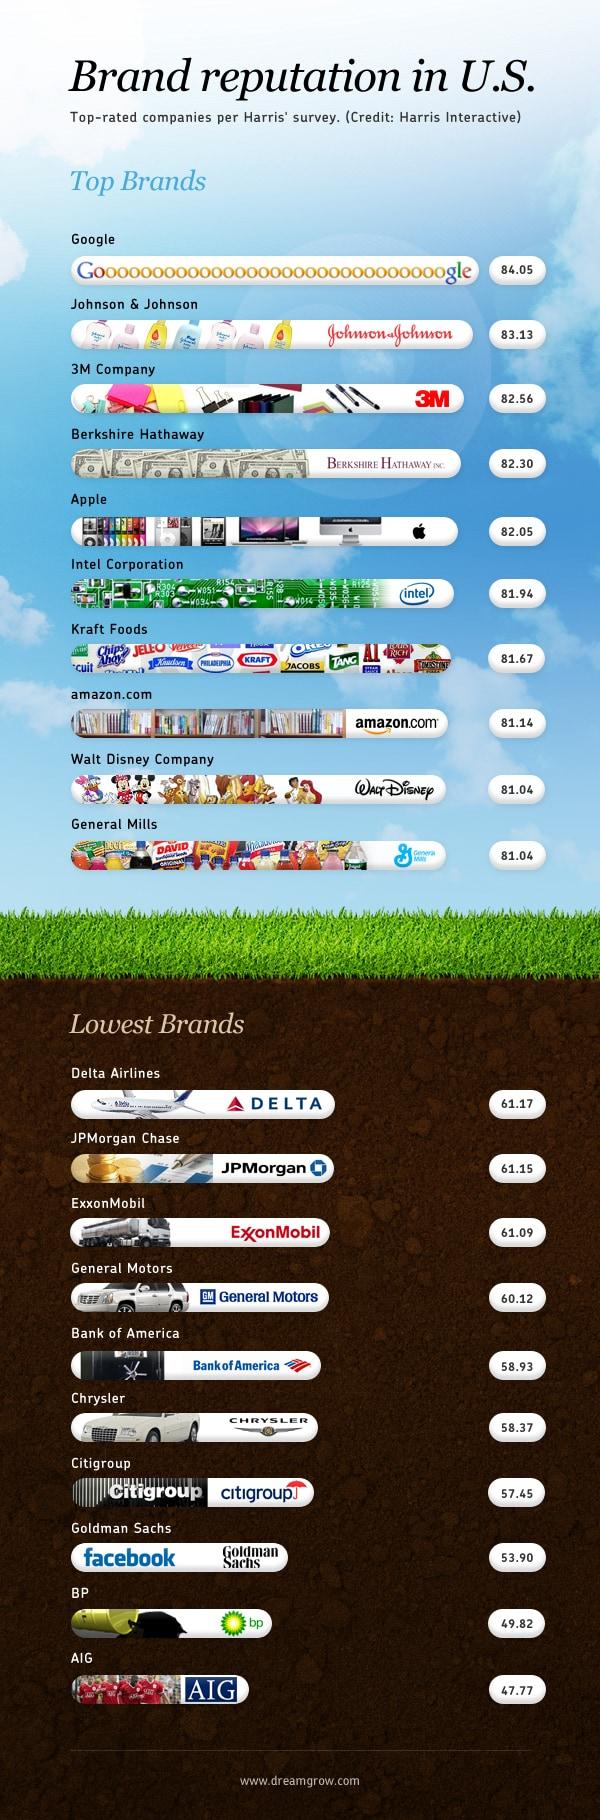 Global top brands 2011 RQ